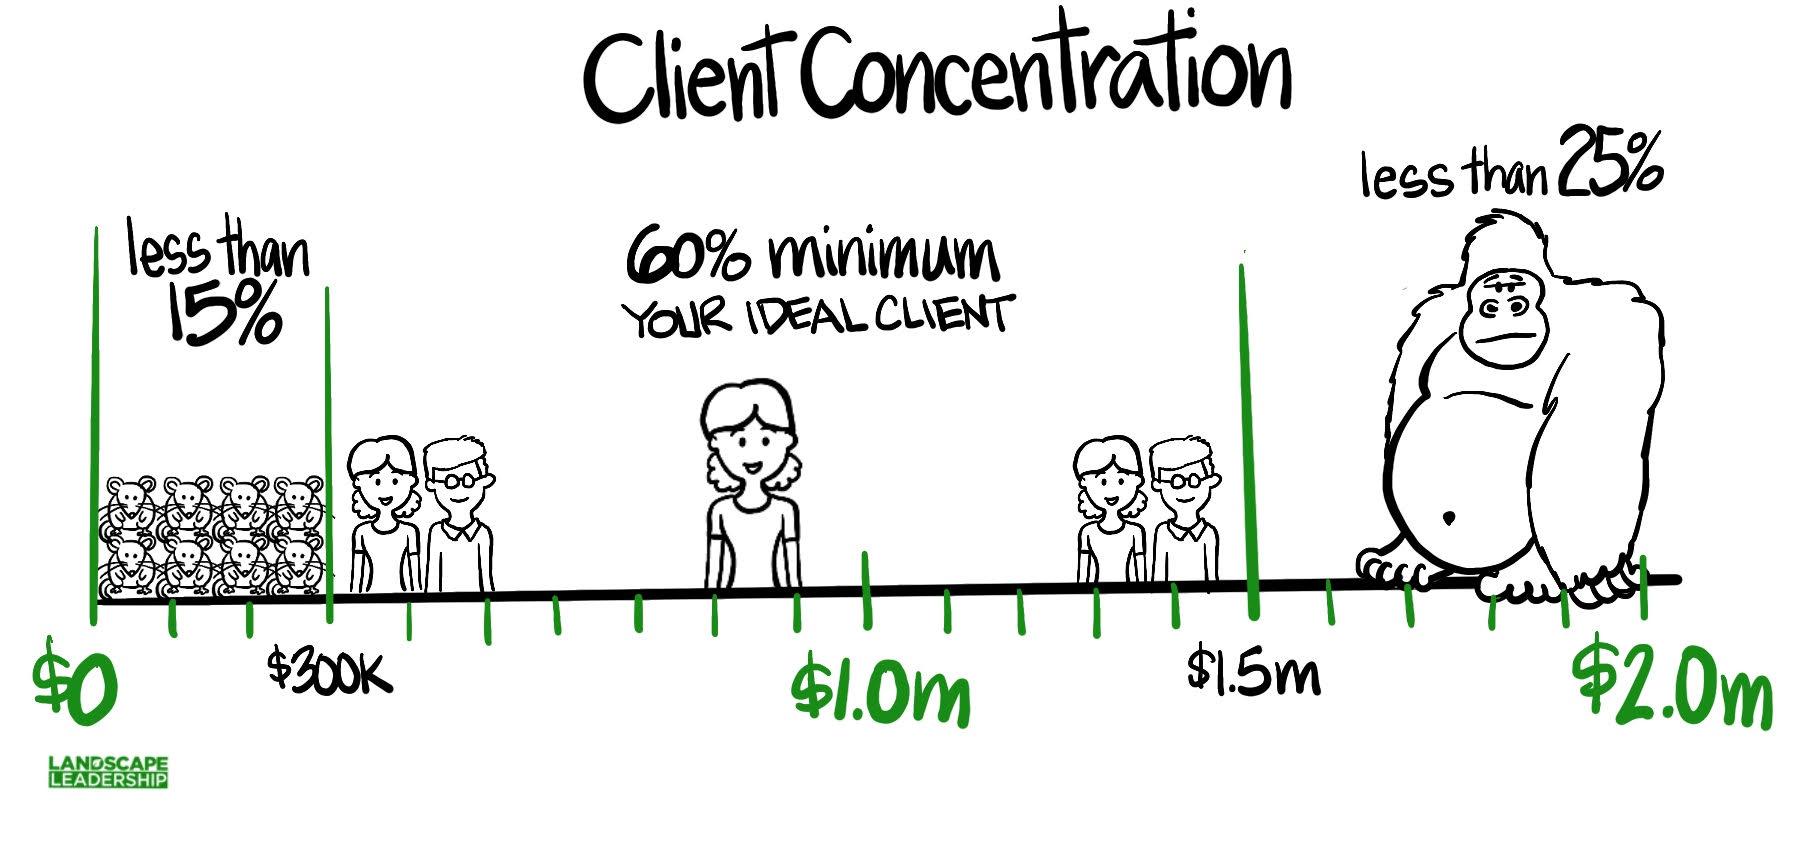 ideal client concentration